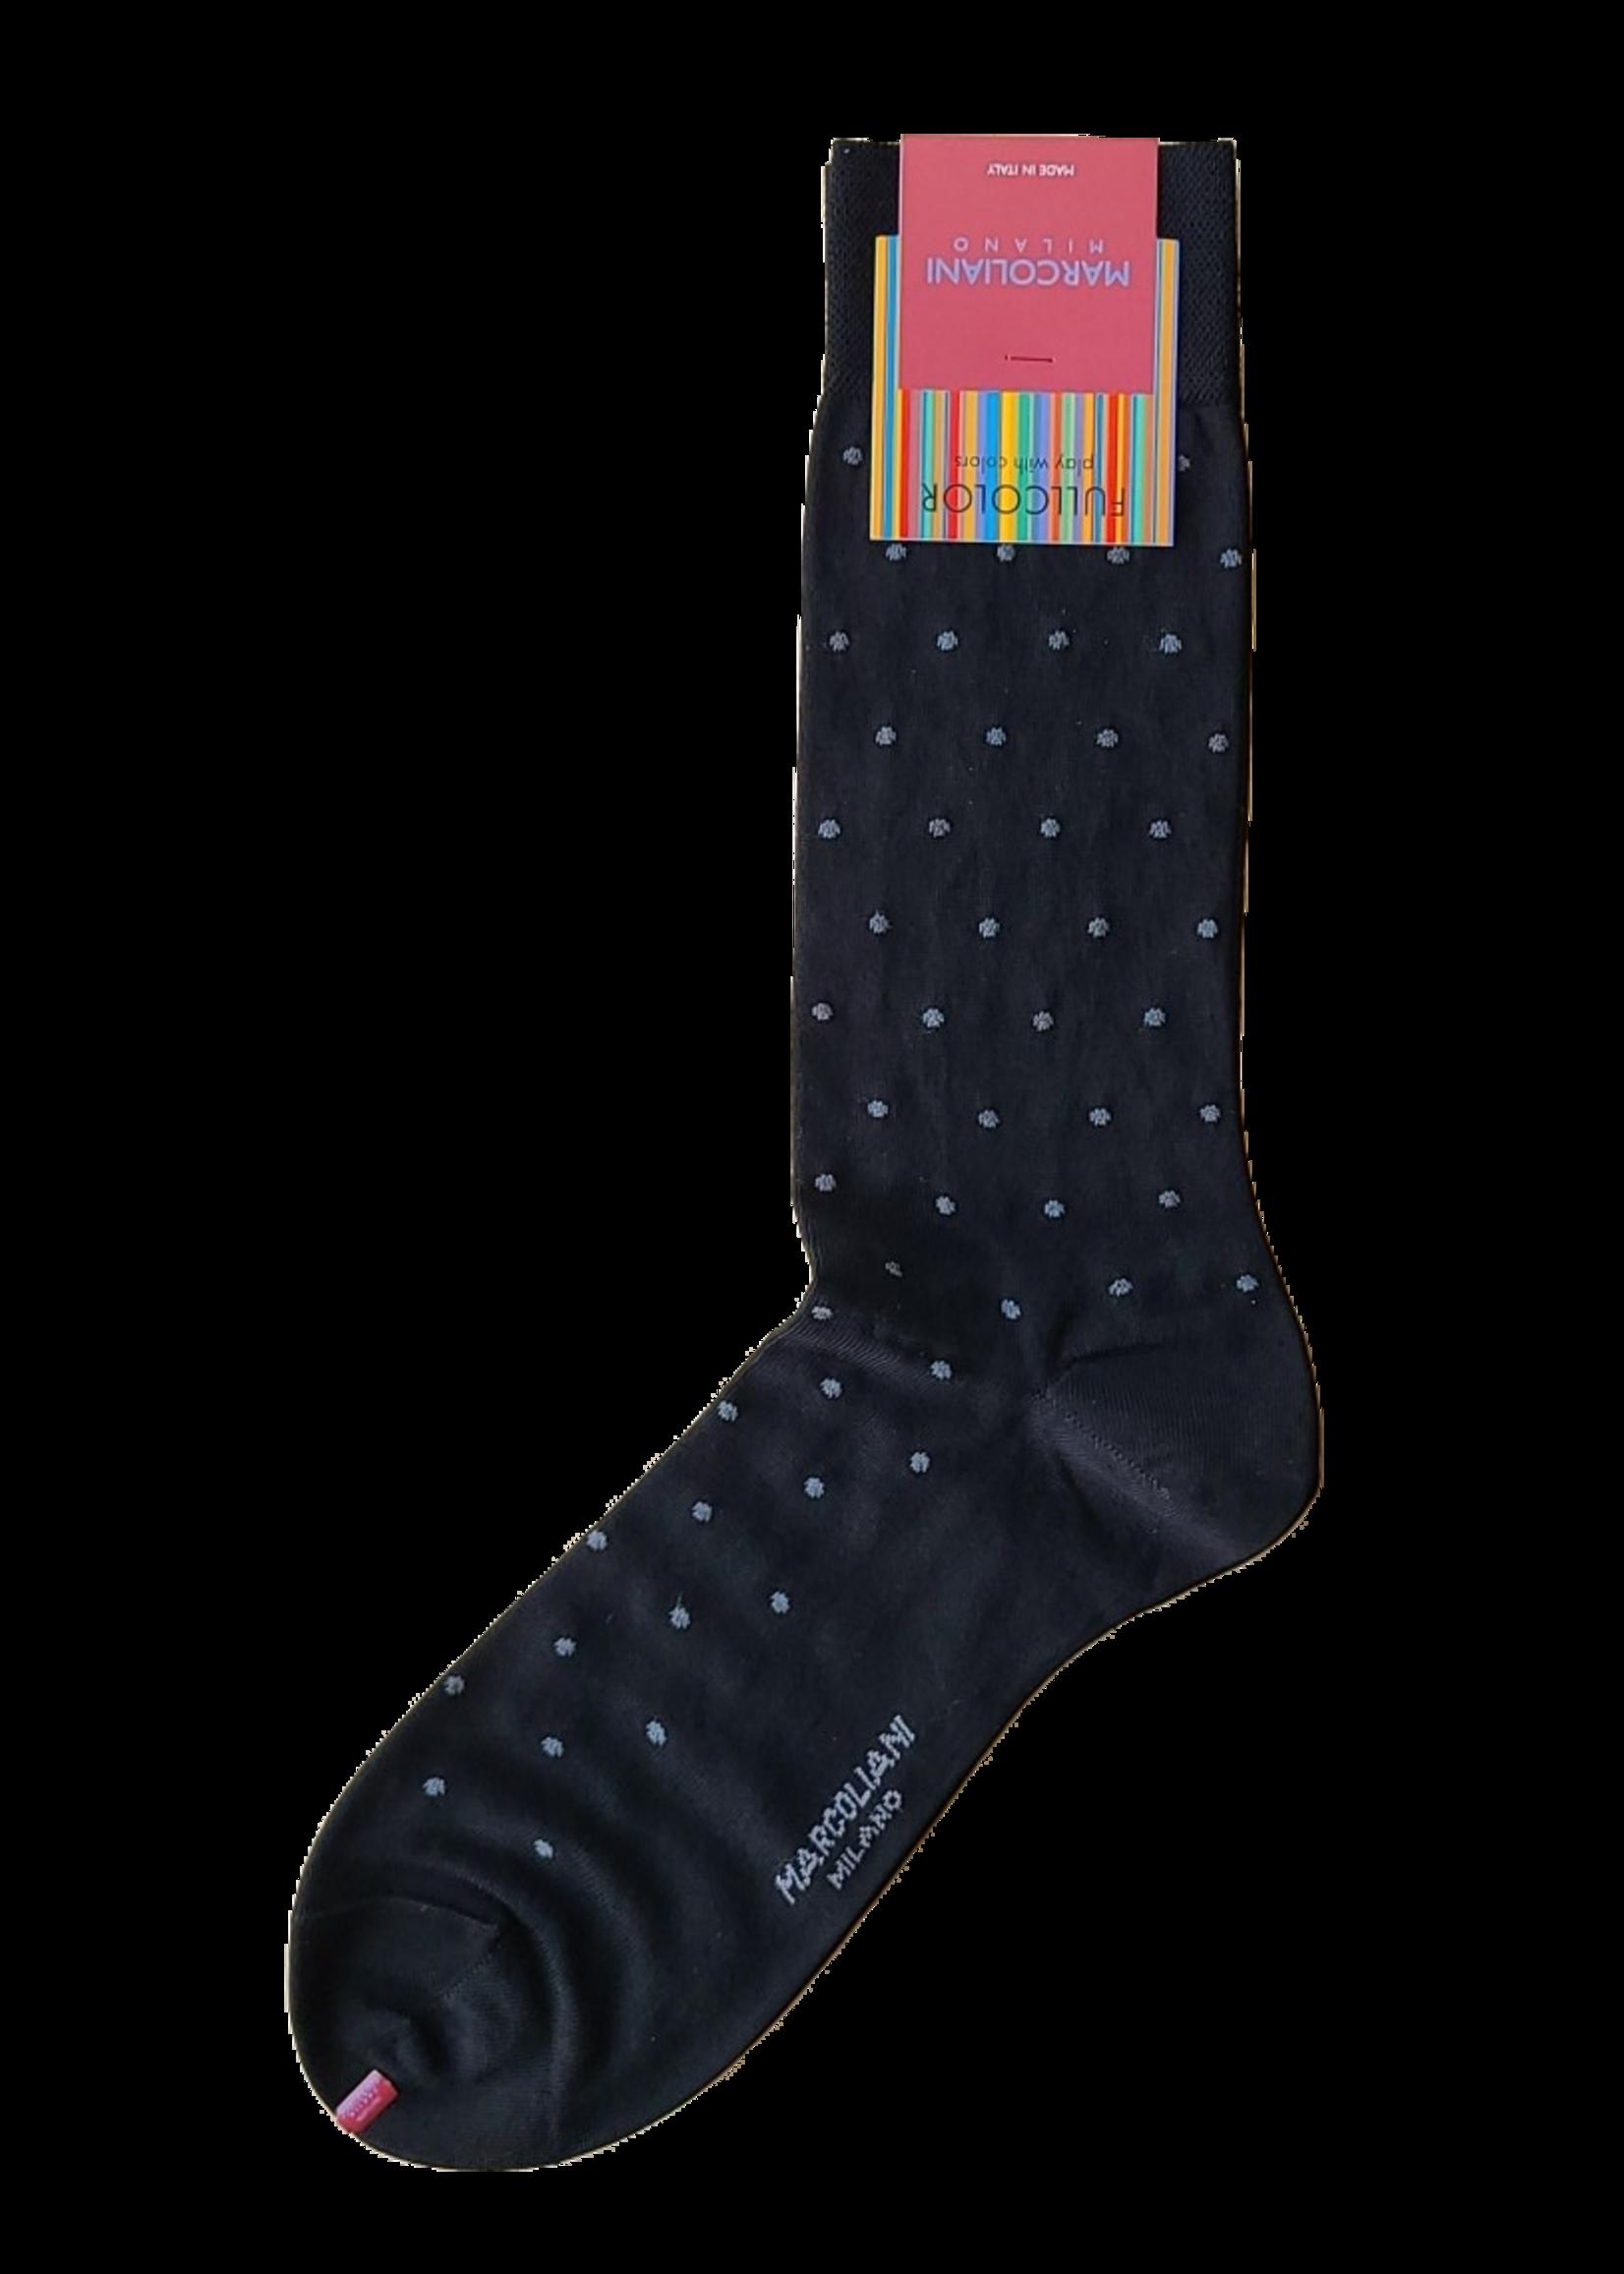 Marcoliani Marcoliani Sock Black Polka Dot